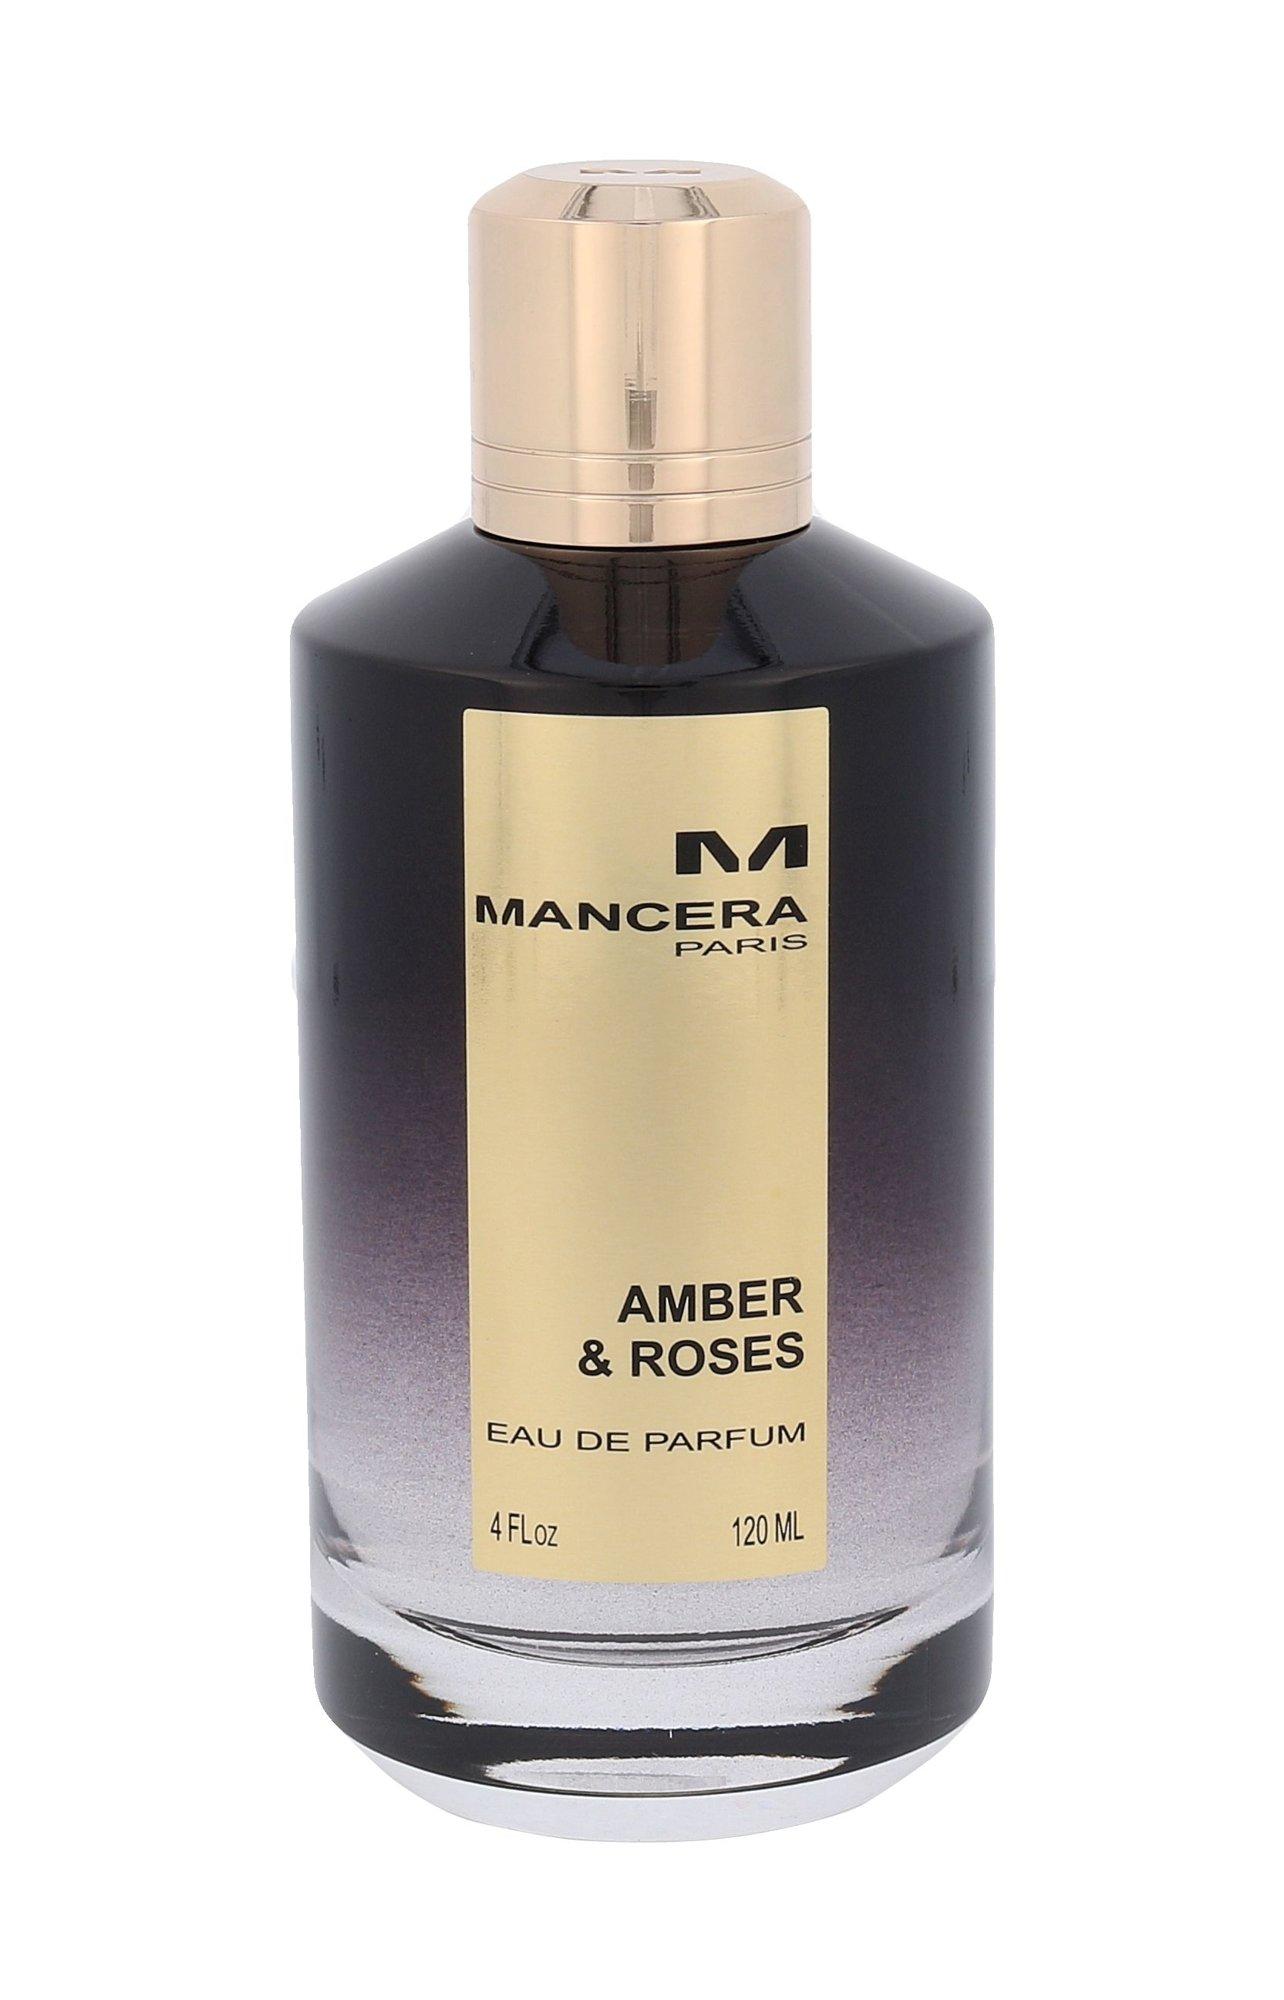 MANCERA Amber & Roses Eau de Parfum 120ml